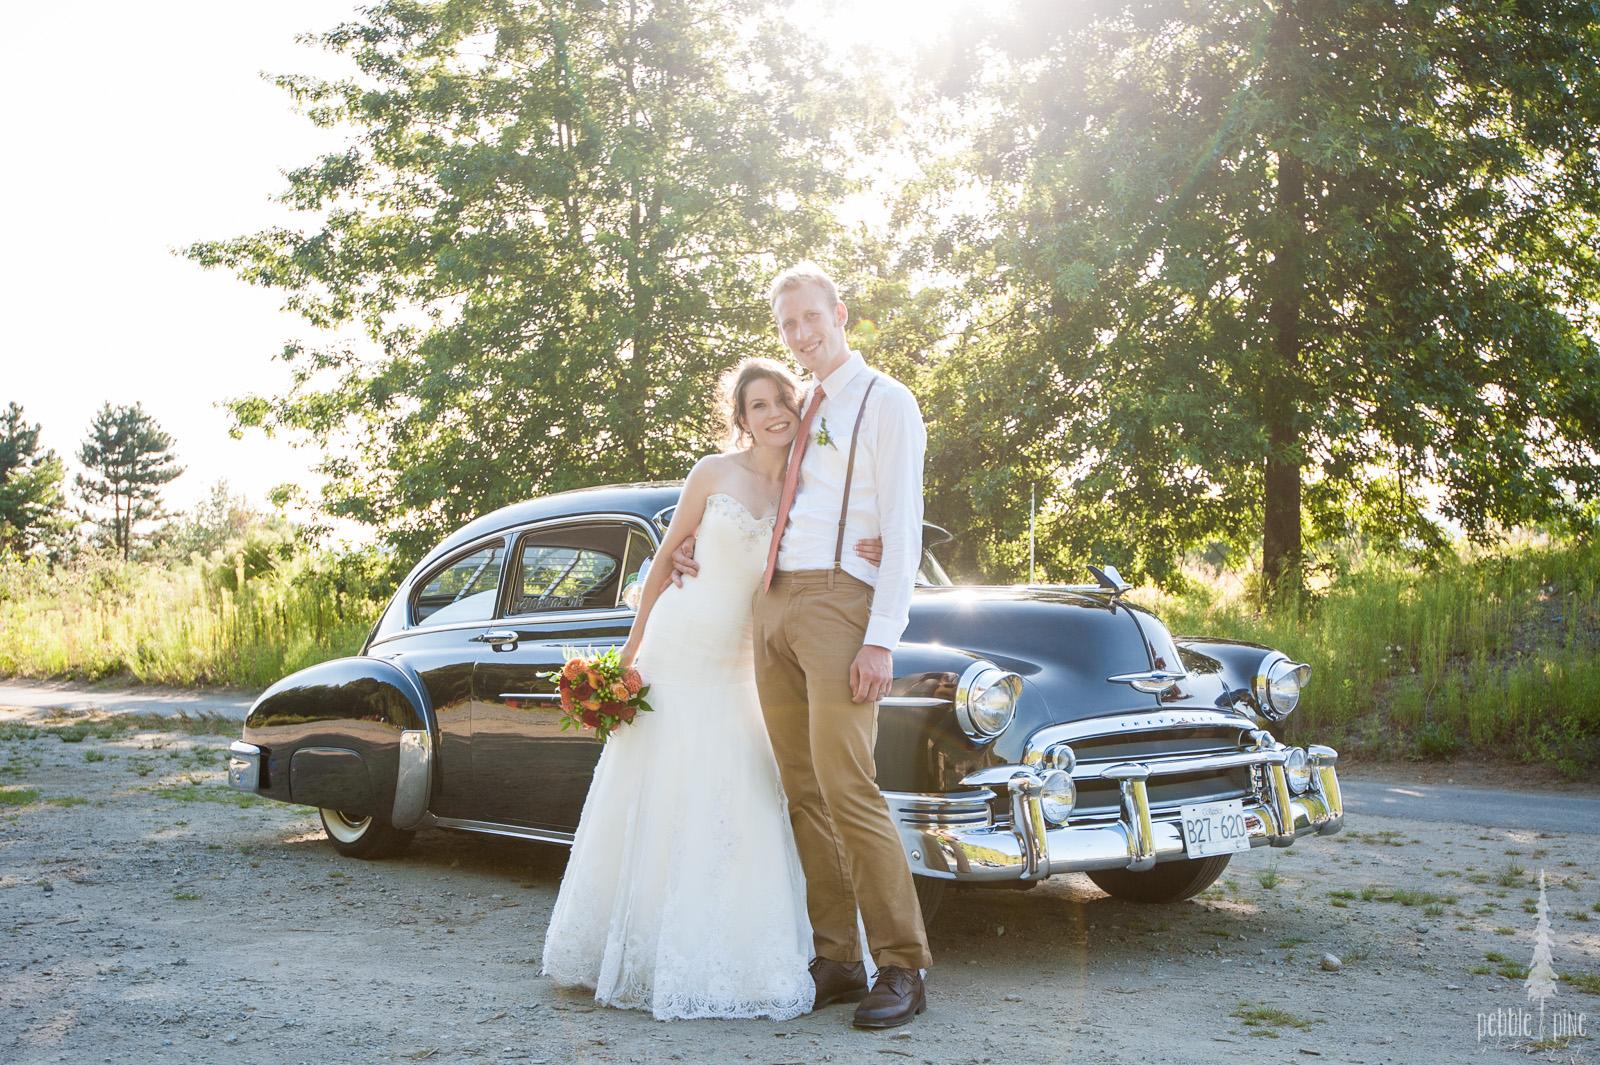 vancouver-island-wedding-photographers-golden-eagle-golf-course-wedding-mountaintop-wedding-50.jpg